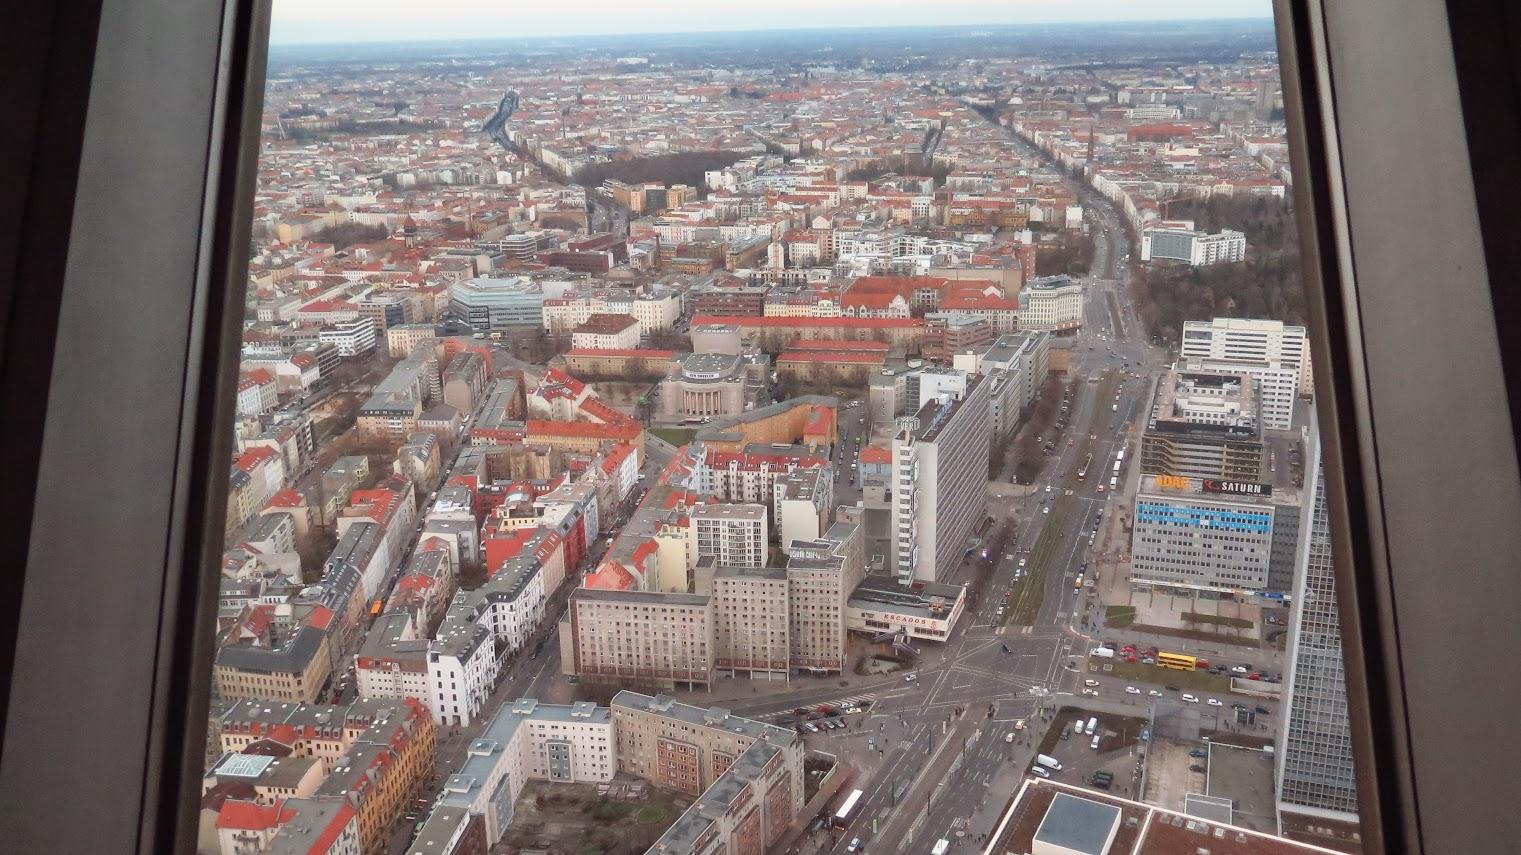 Torre de TV em Berlim: turismo na Berliner Fernsehturm